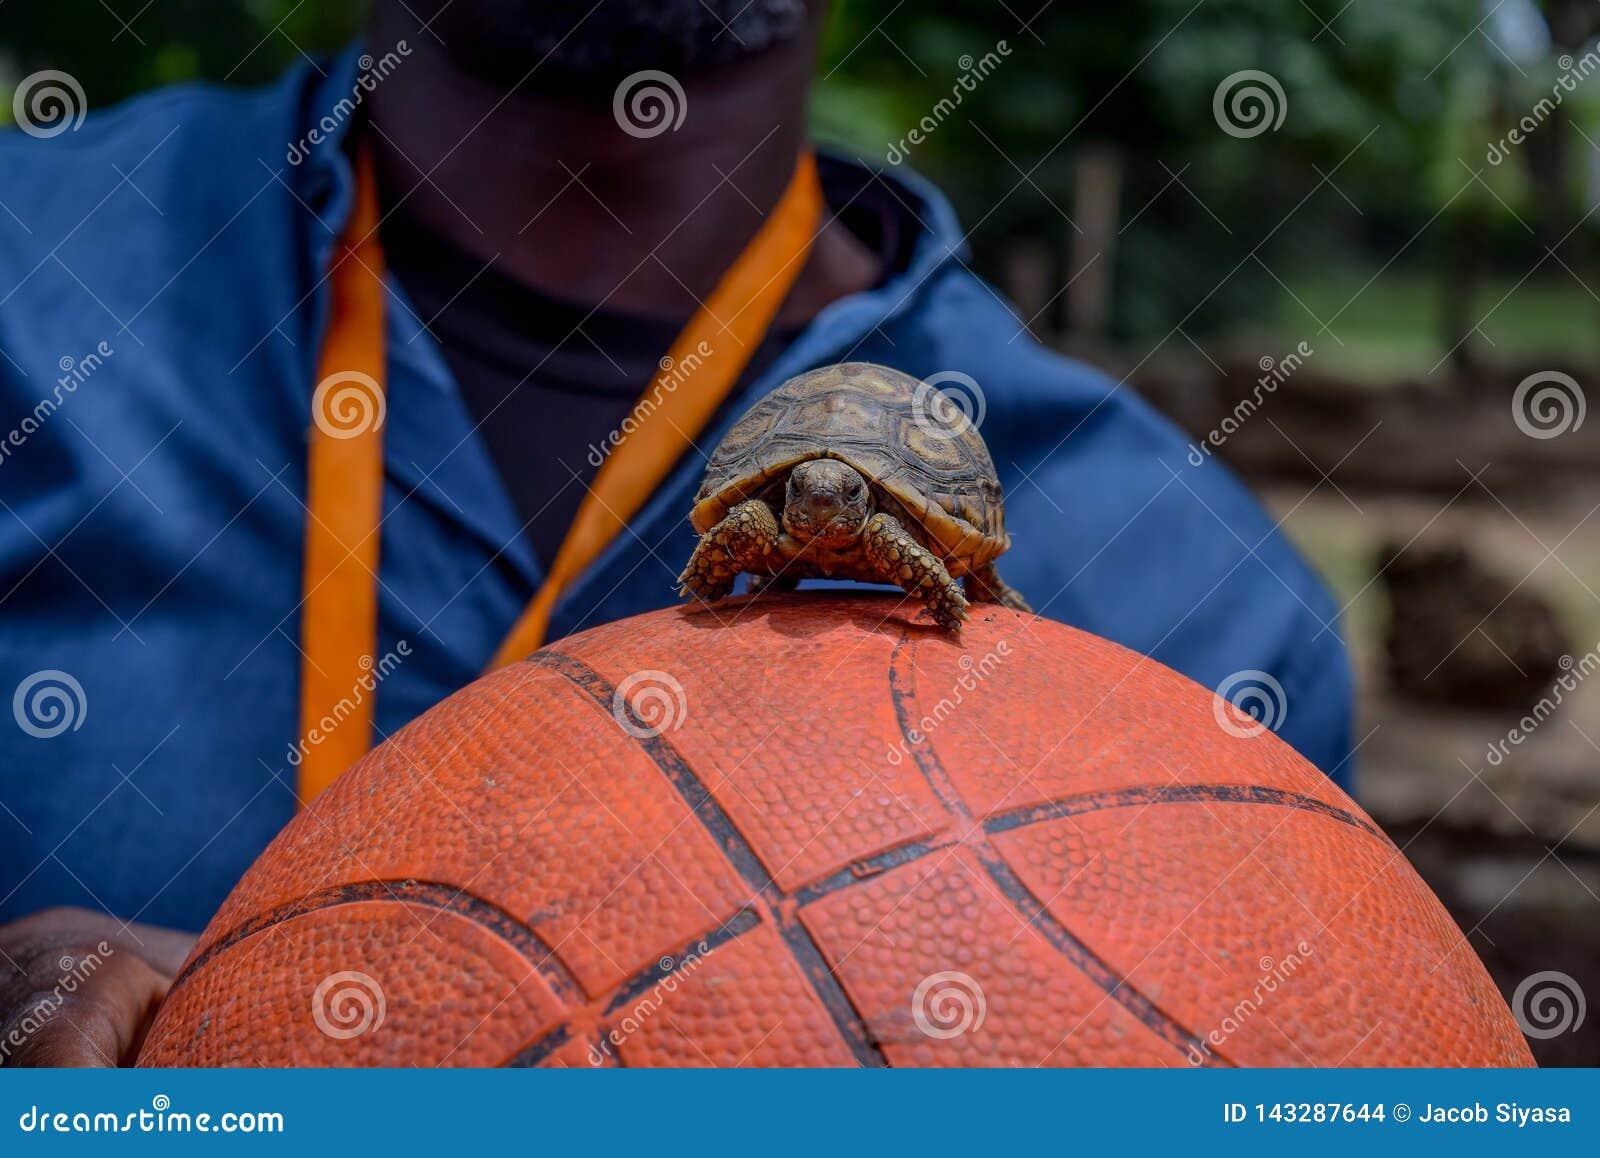 Liten sköldpadda